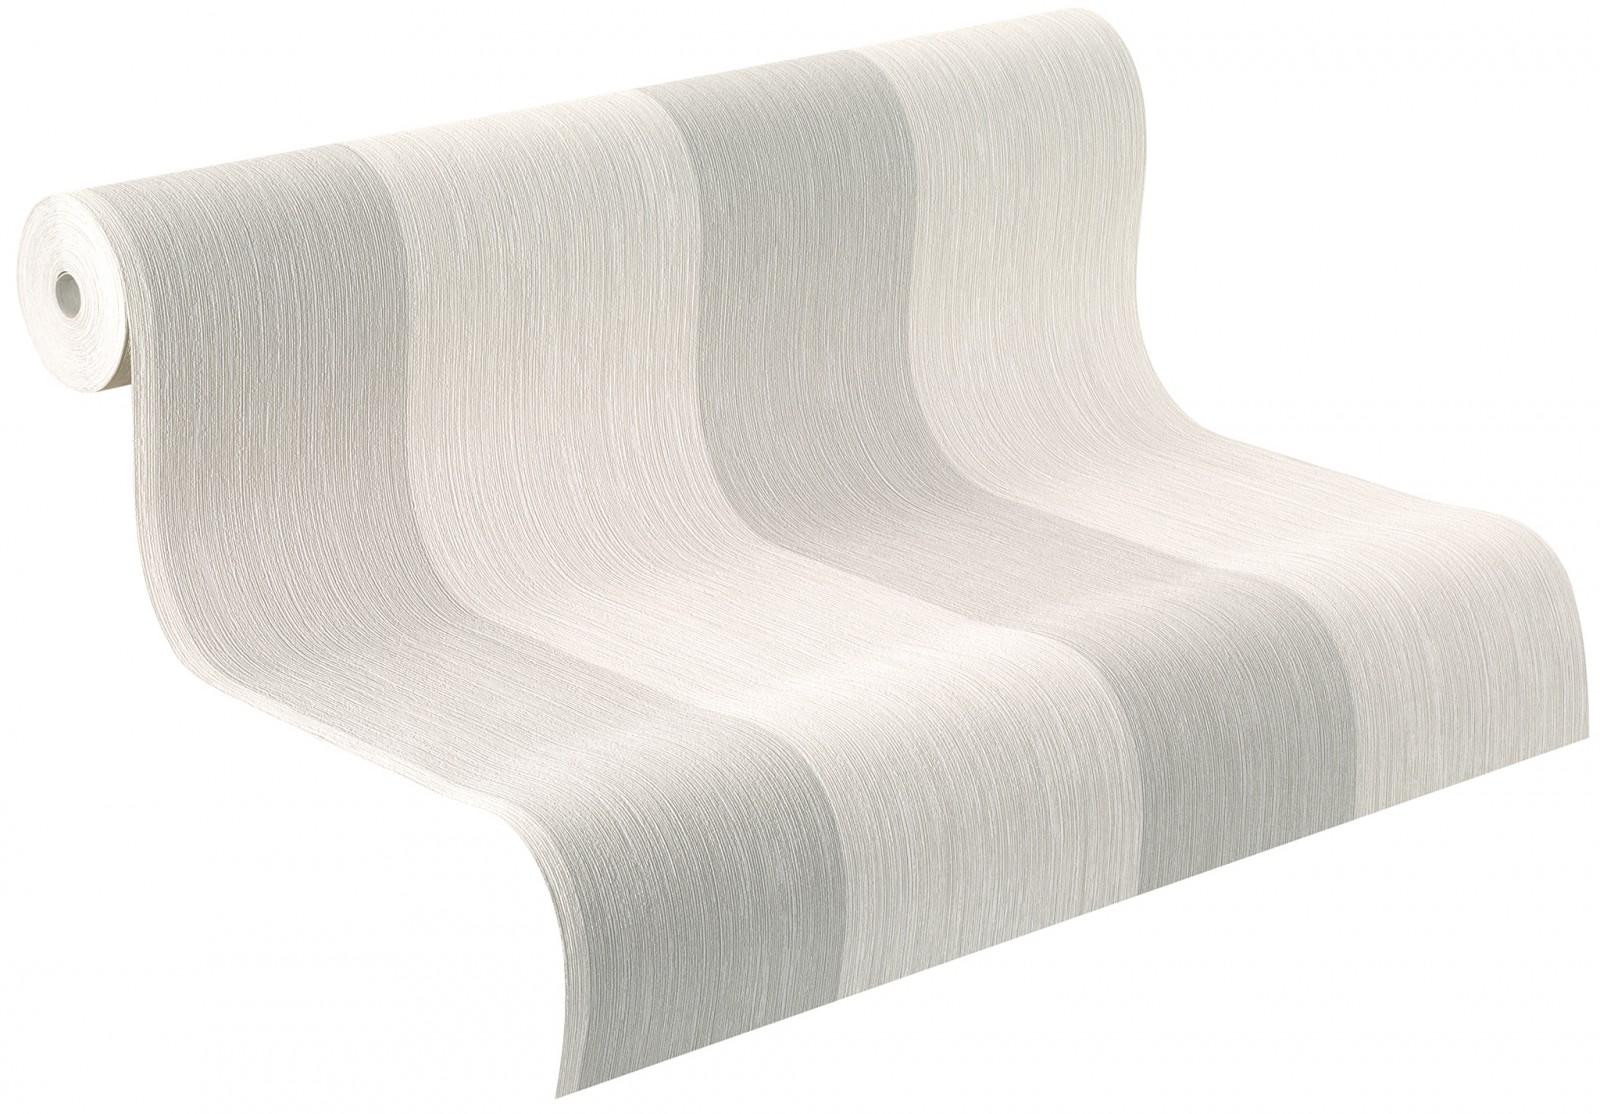 vliestapete grau wei streifen perfecto rasch 887723. Black Bedroom Furniture Sets. Home Design Ideas